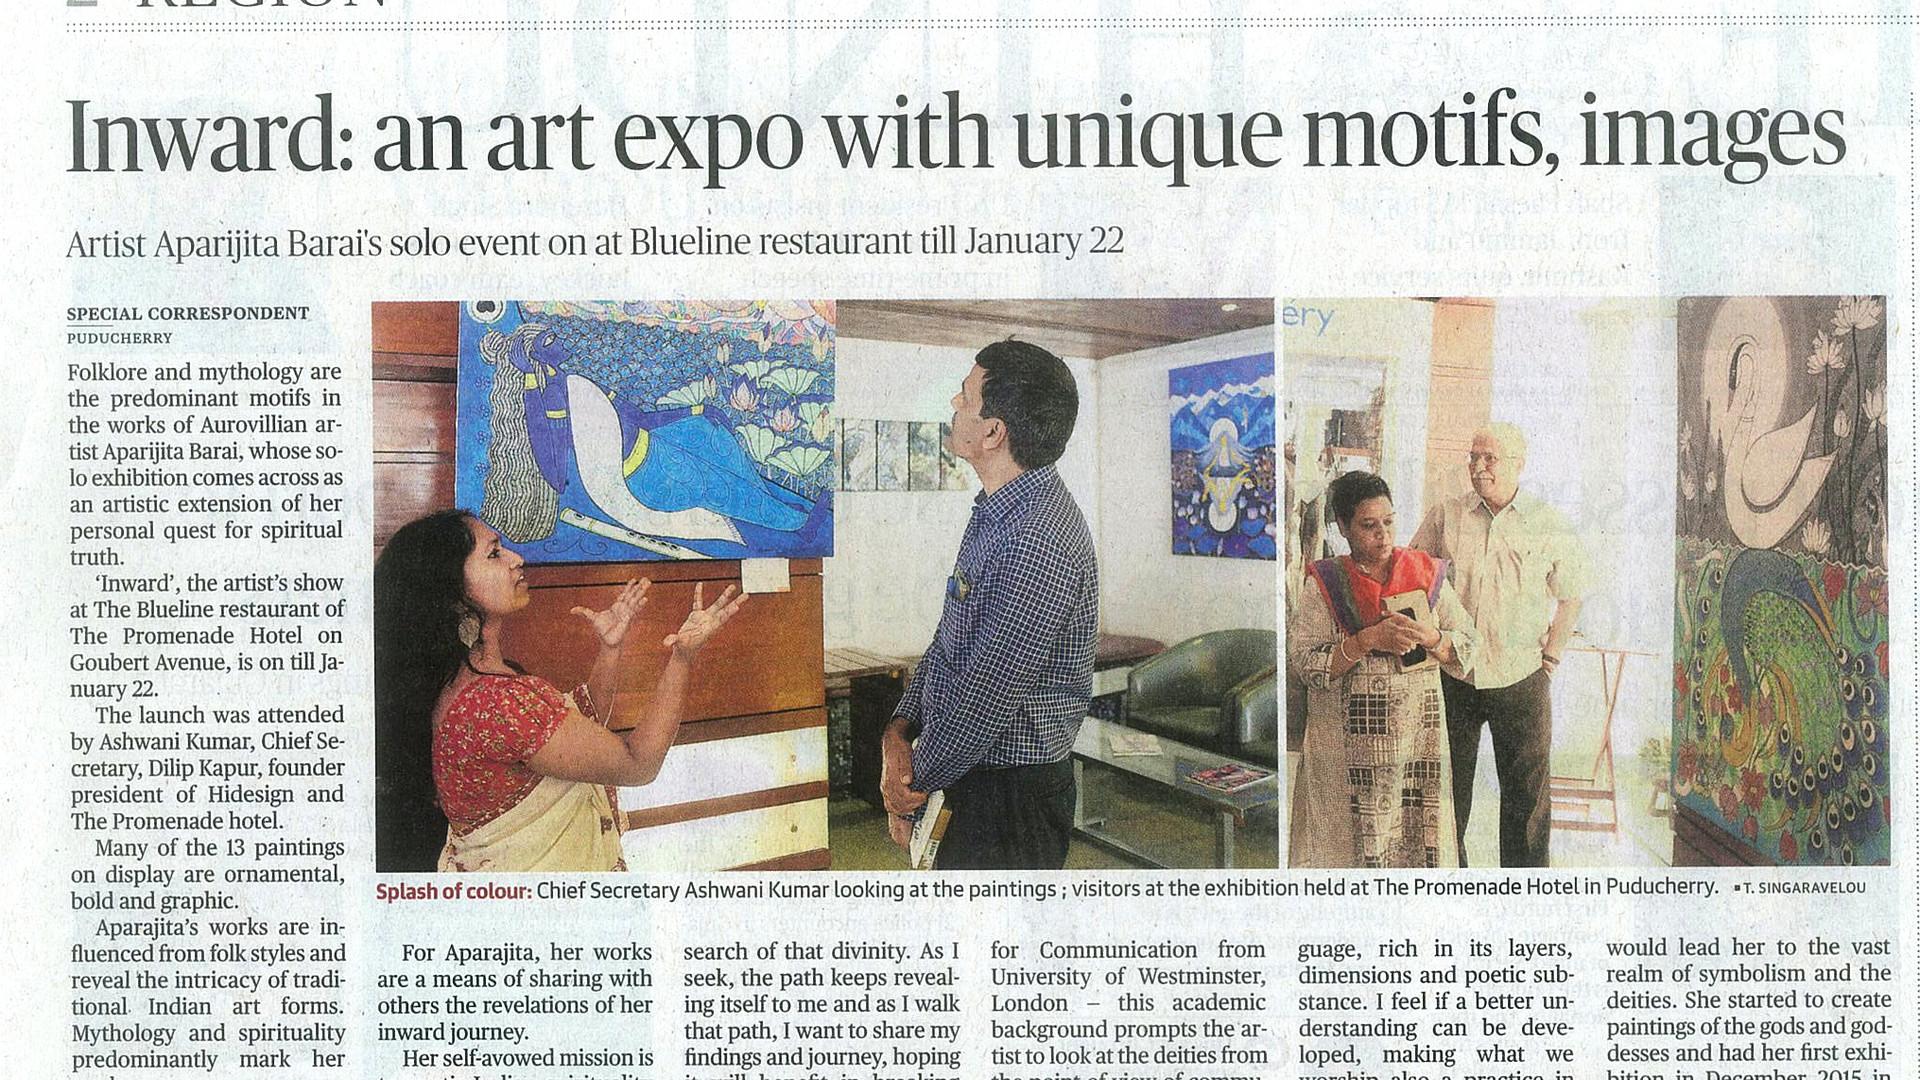 The Hindu | Puducherry | Jan 10, 2019